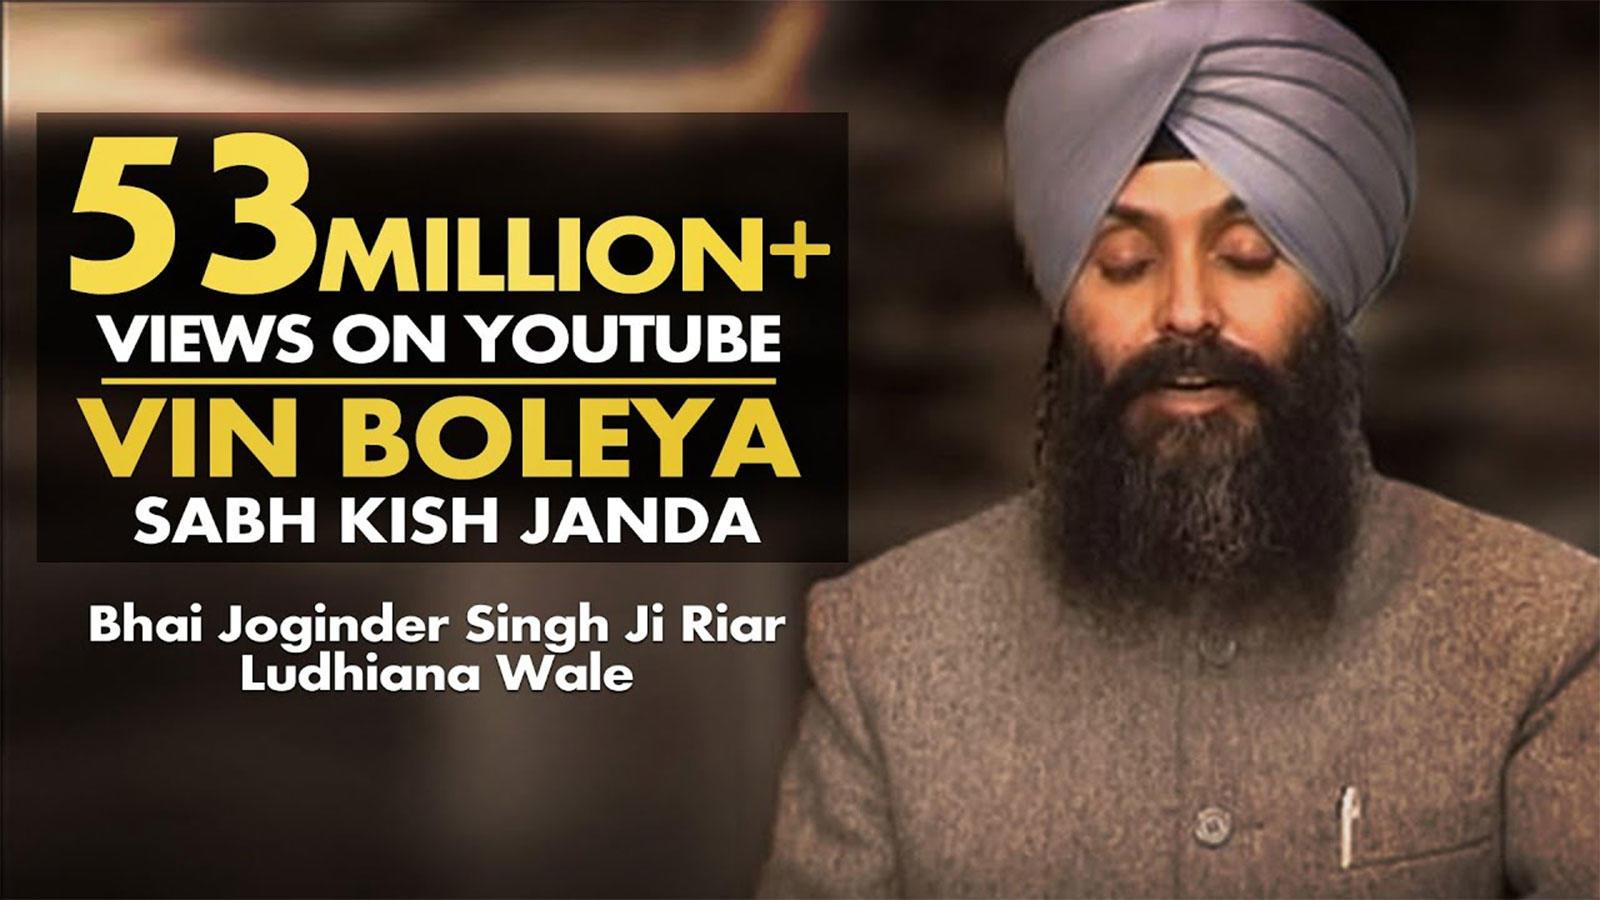 Punjabi Song Vin Boleya Sabh Kish Janda Sung By Bhai Joginder Singh Riar Ludhiana Wale Punjabi Video Songs Times Of India